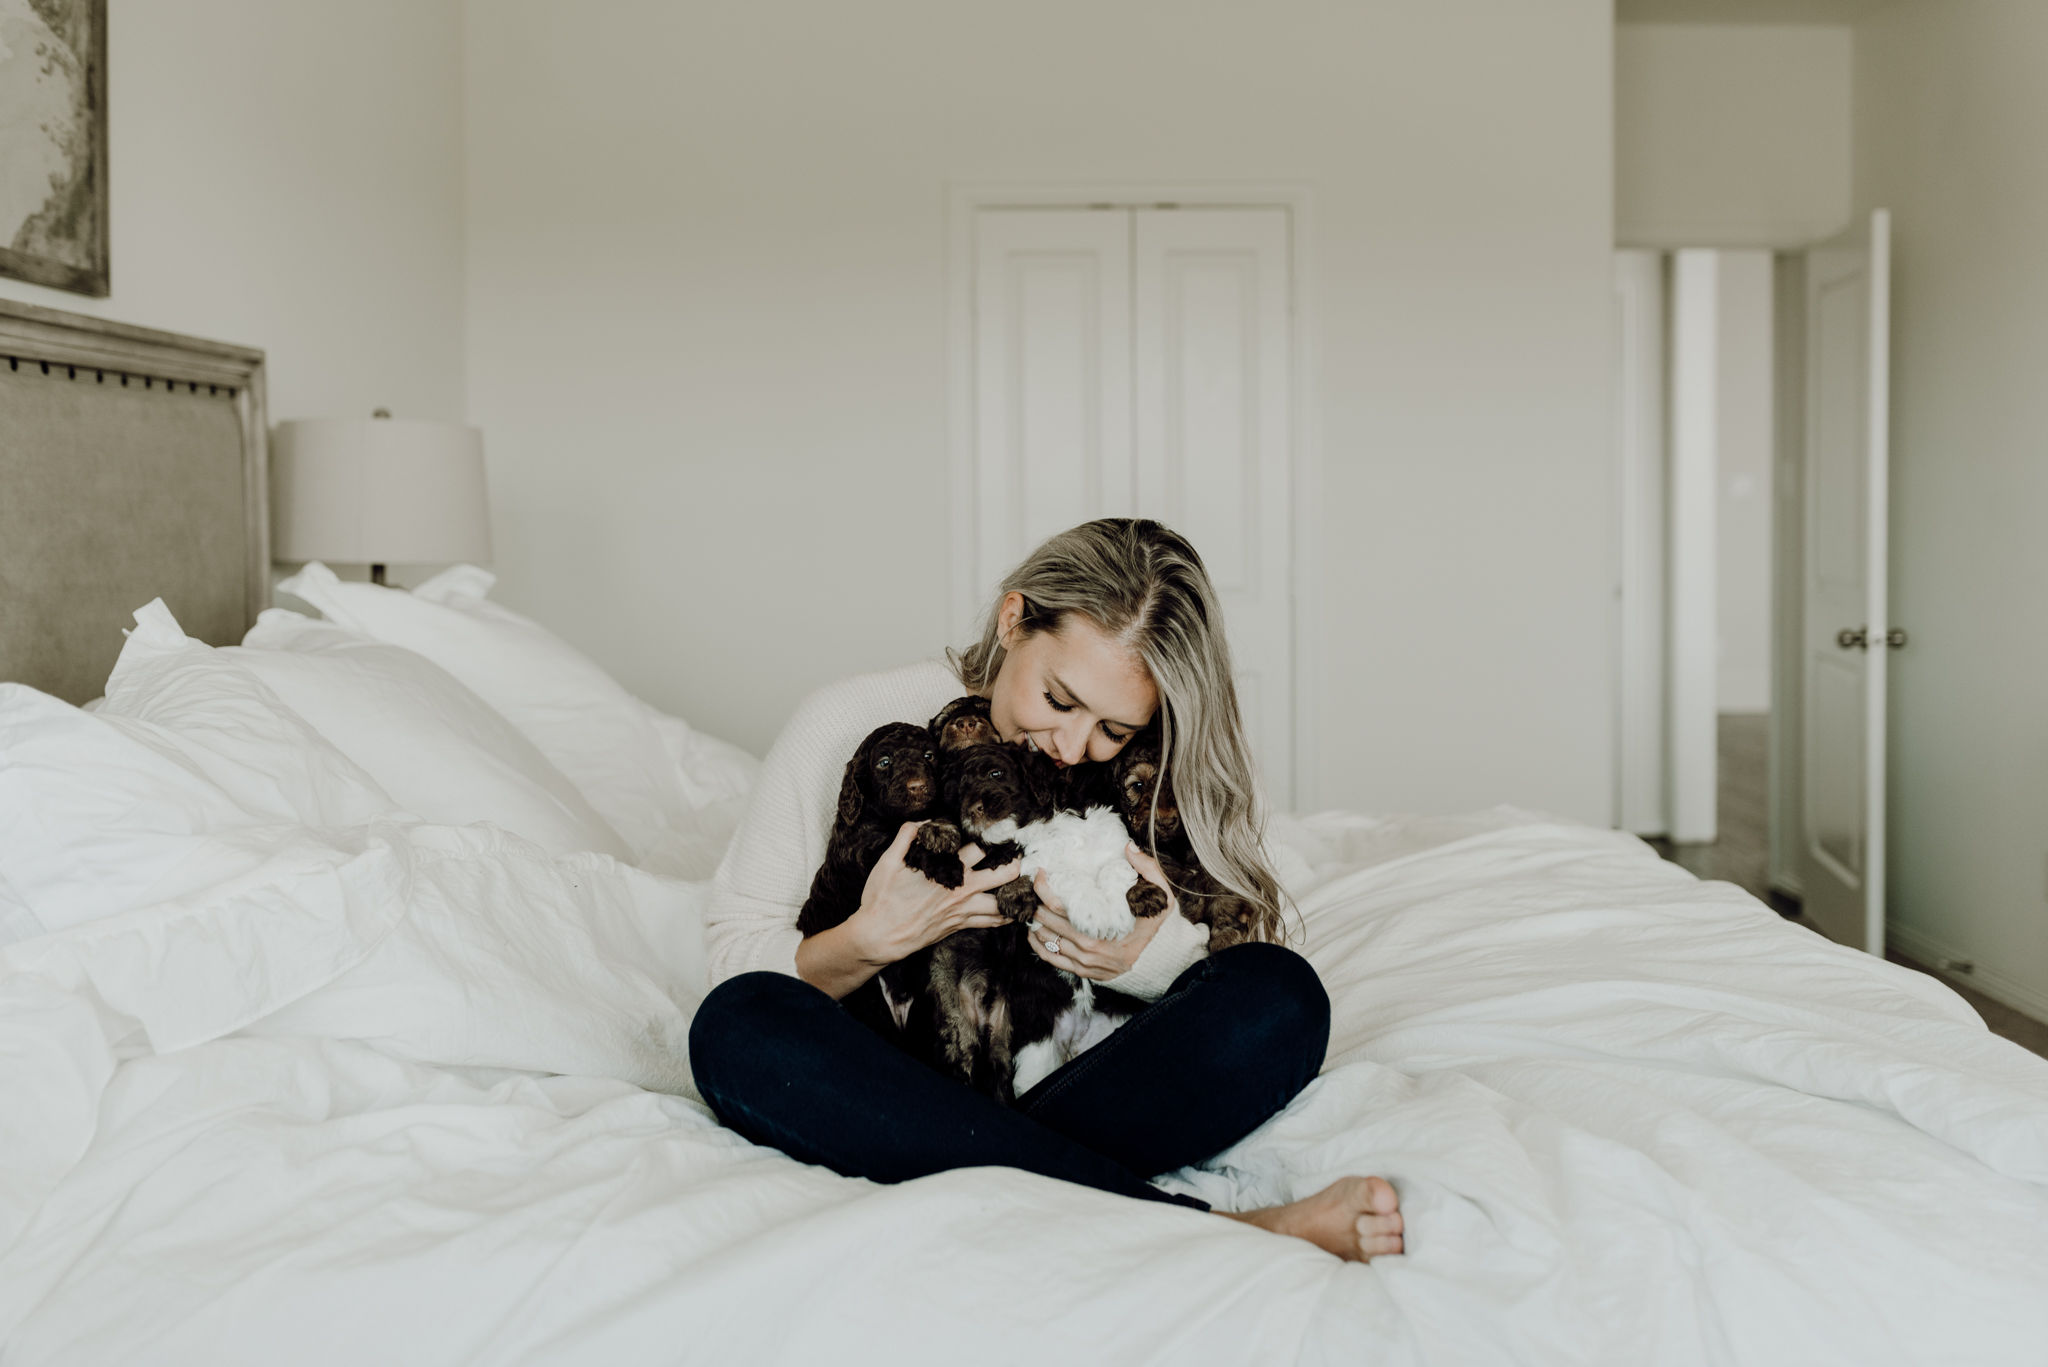 houston-wedding-photographer-in-home-maternity-session-puppies- Houston Wedding Photographer -Kristen Giles Photography-60.jpg